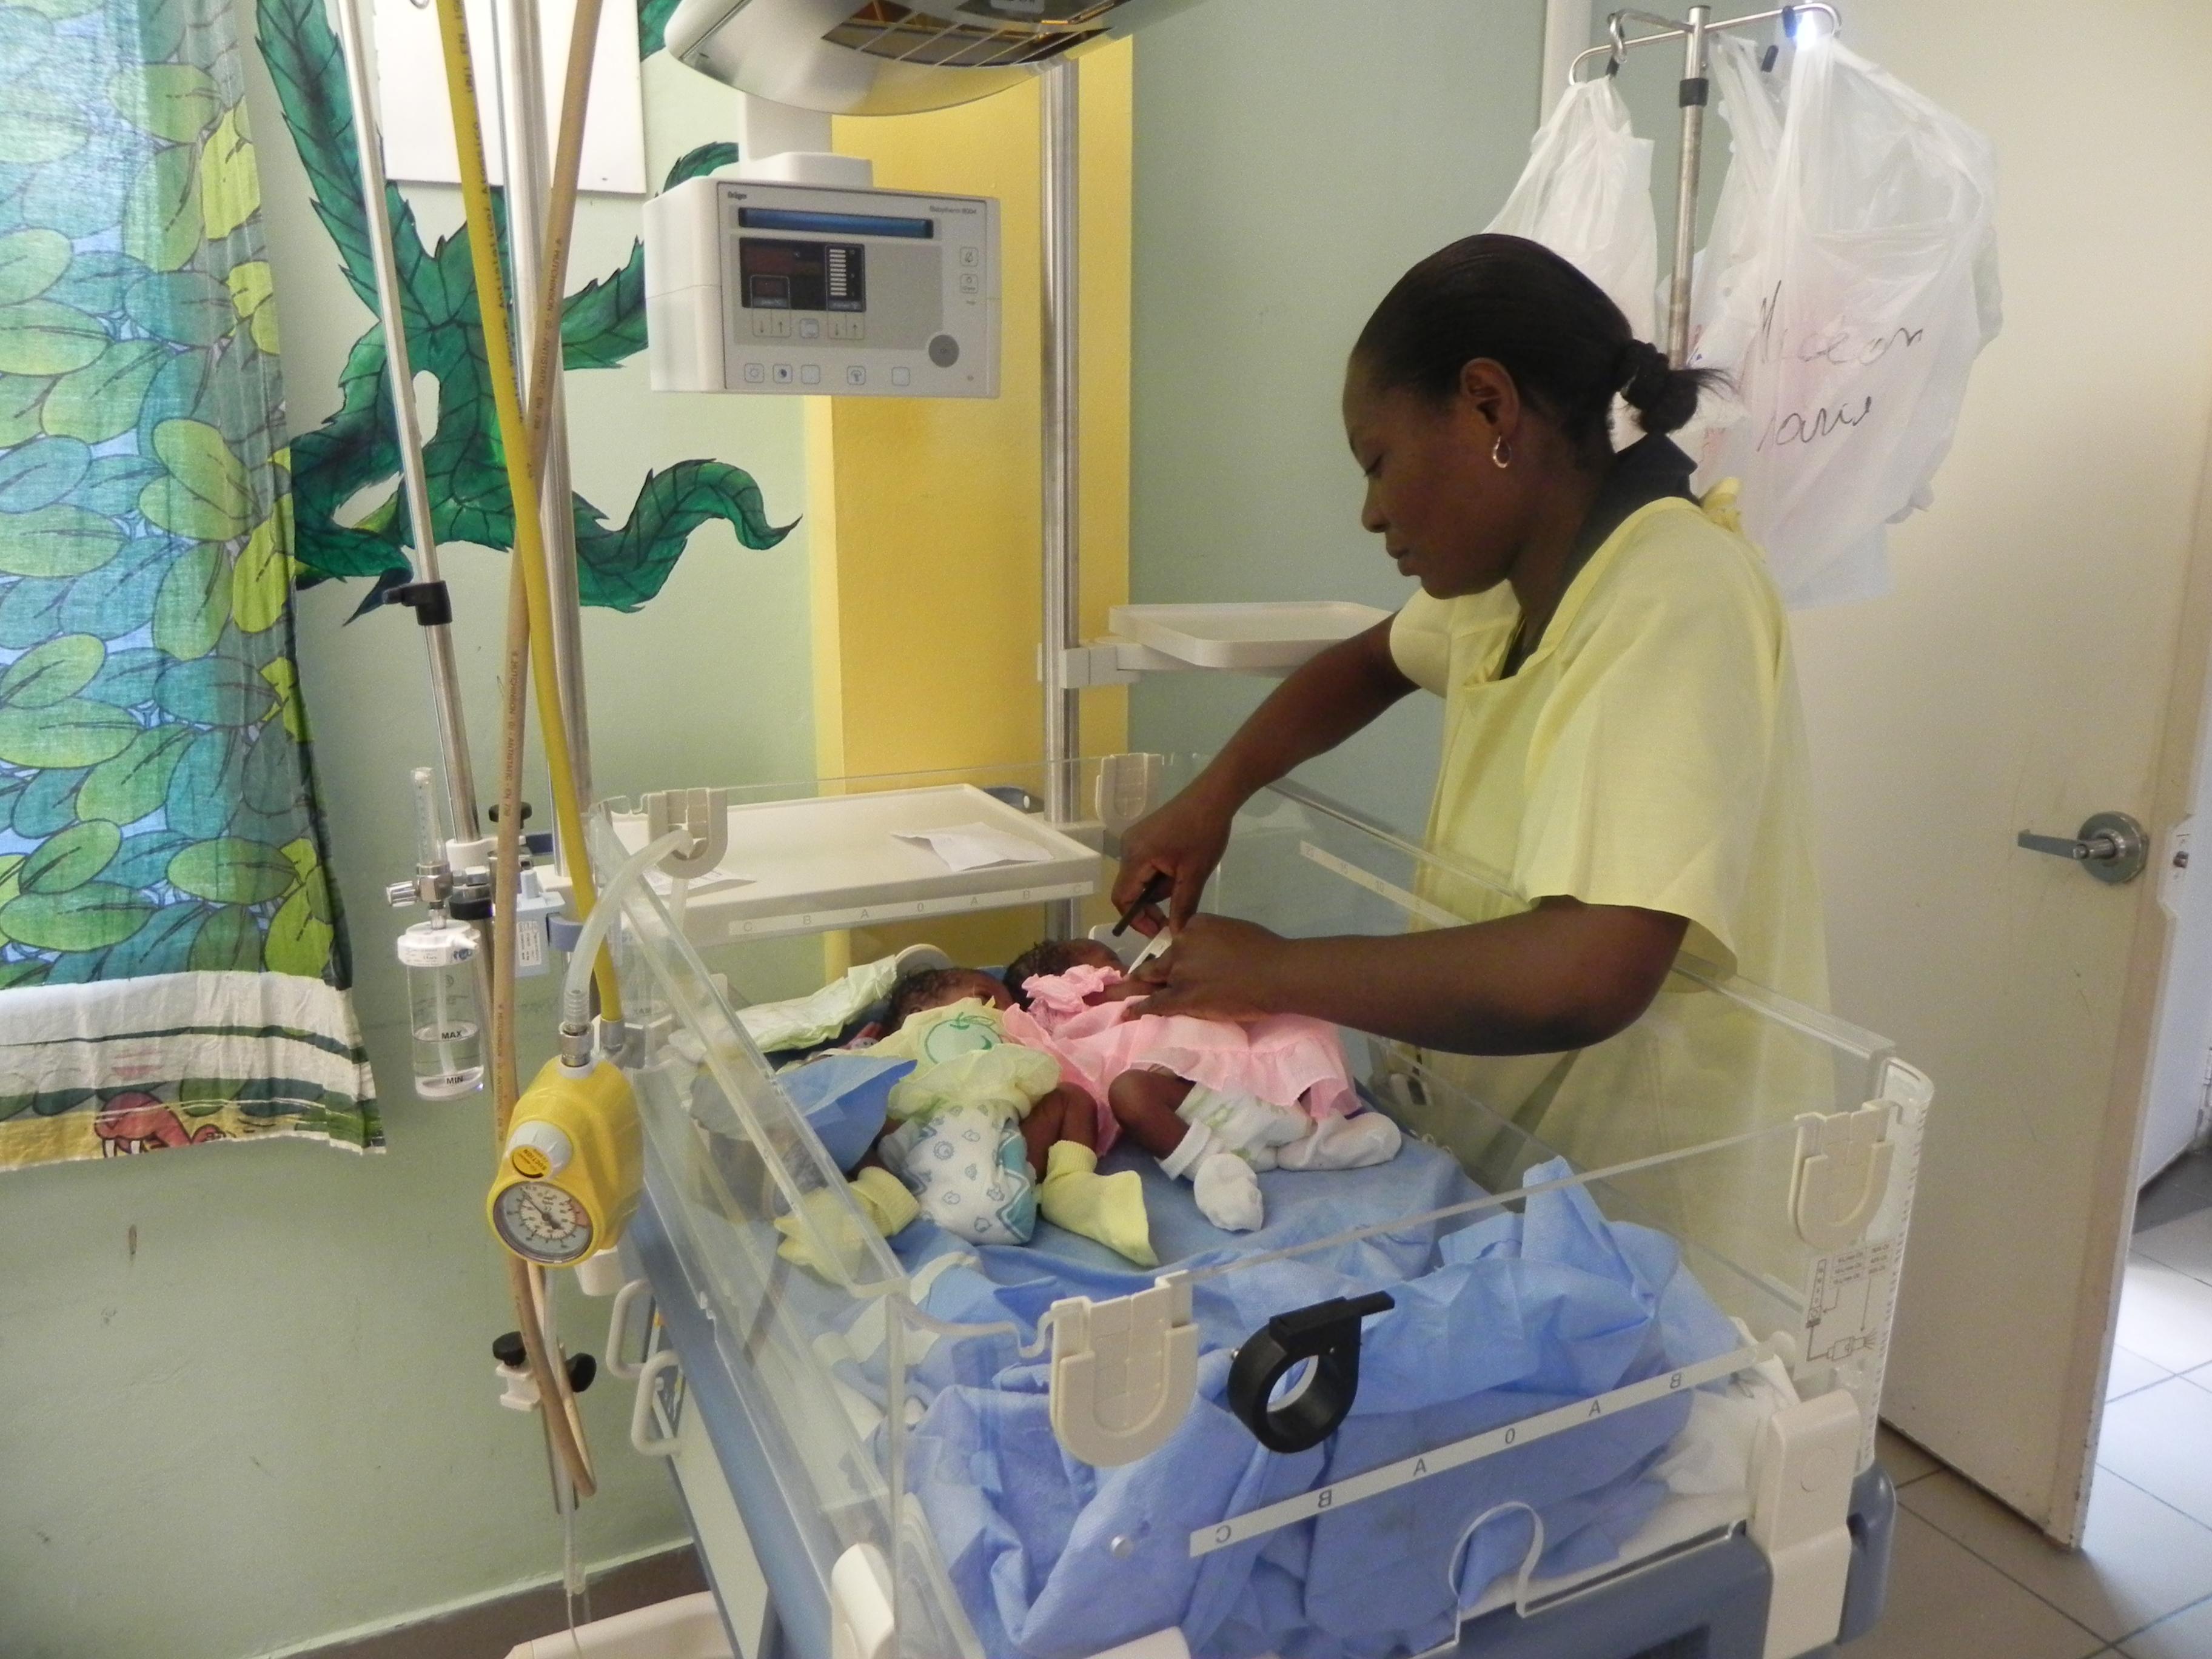 Sala Parto Ospedale Papa Giovanni Xxiii Bergamo : Ospedale san paolo sale parto operative dopo cedimento soffitto